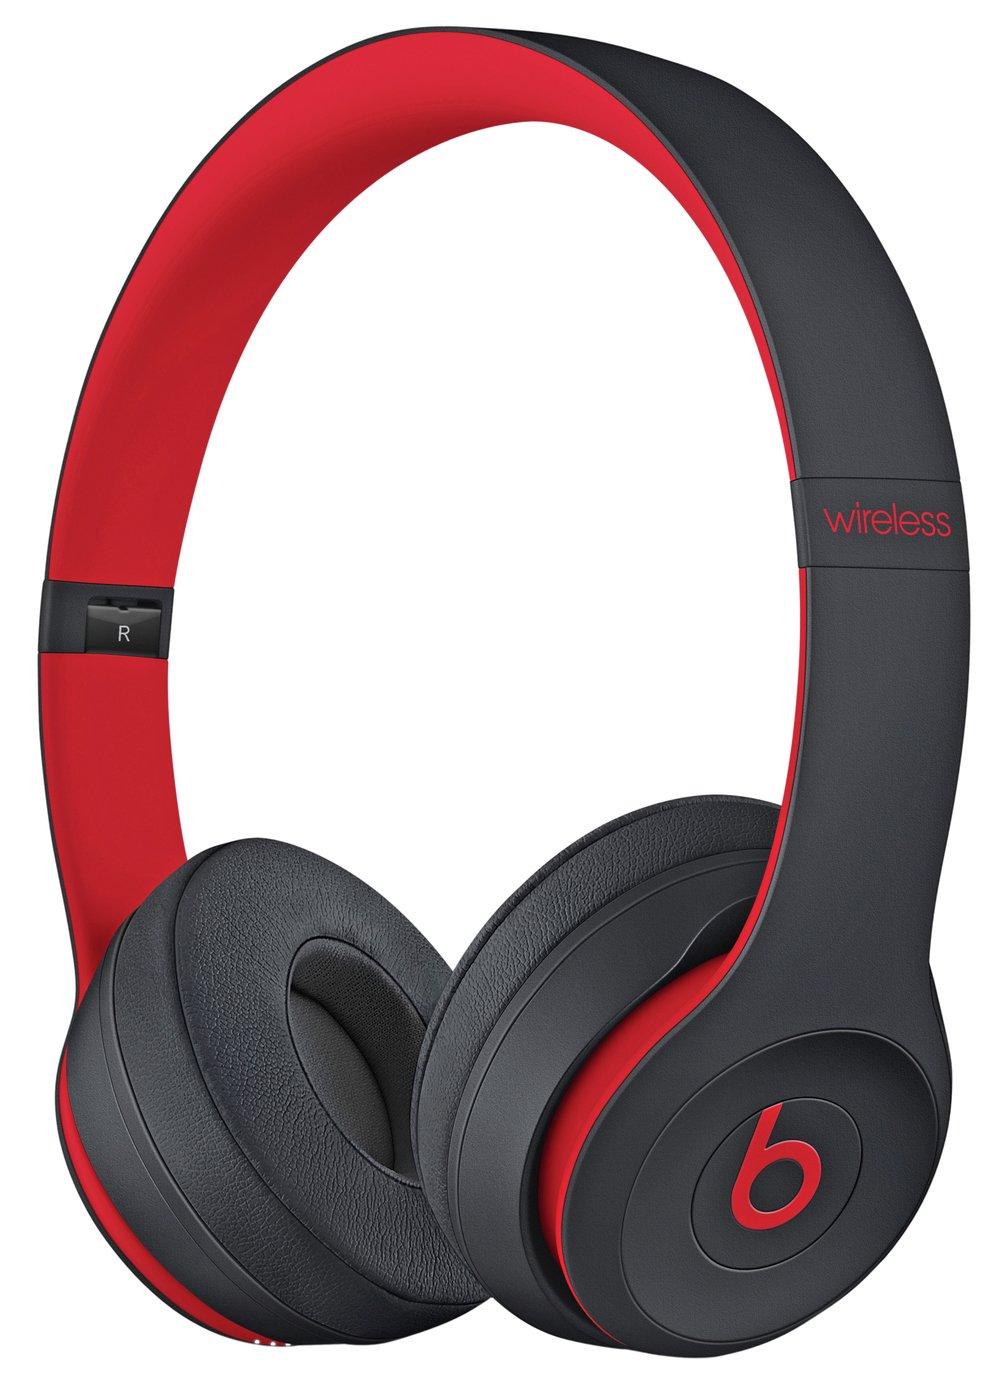 Image of Beats by Dre Solo 3 On Ear Wireless Headphones Decade Edit